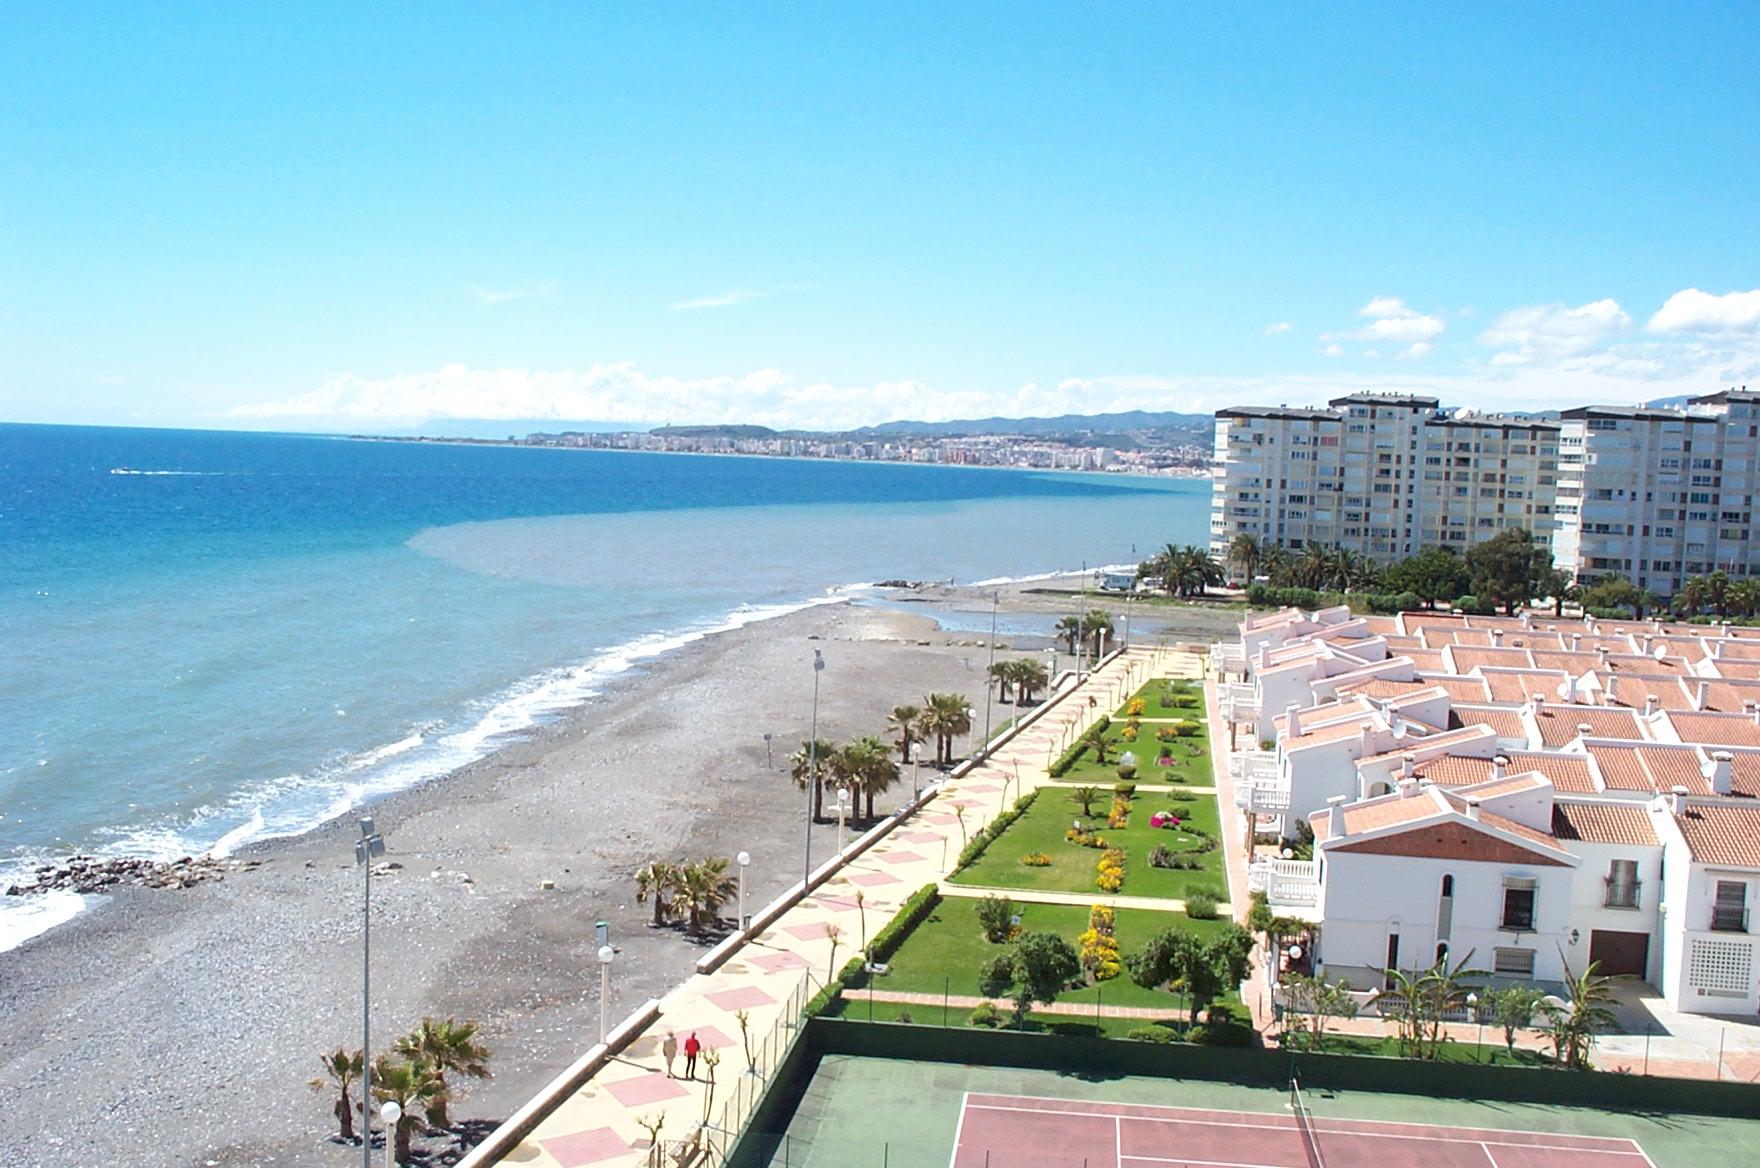 Foto playa Mezquitilla. Mezquitilla.